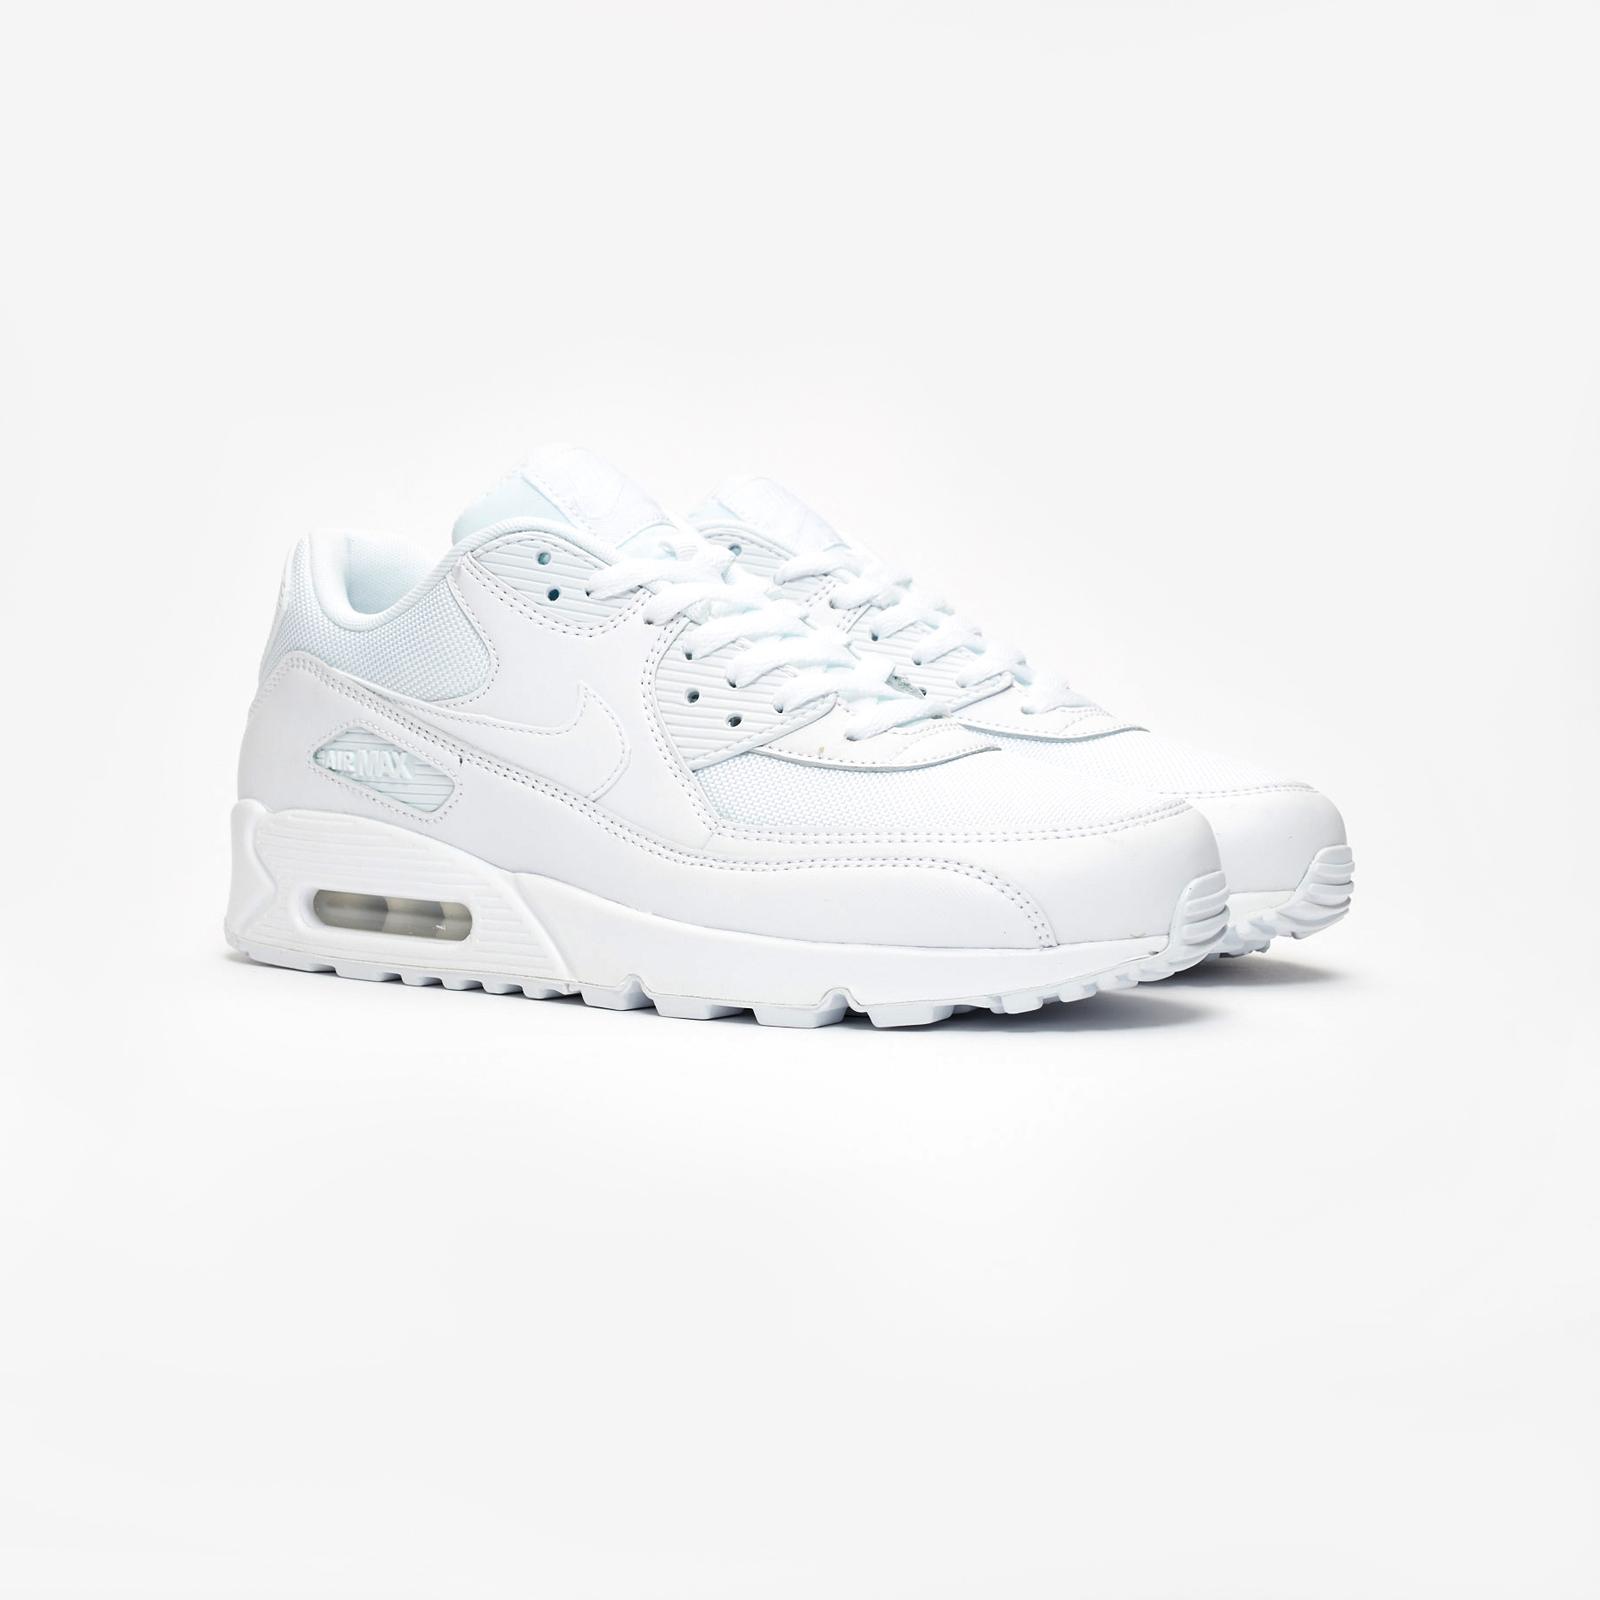 Nike Air Max 90 Essential - 537384-111 - Sneakersnstuff  4953f1c3b